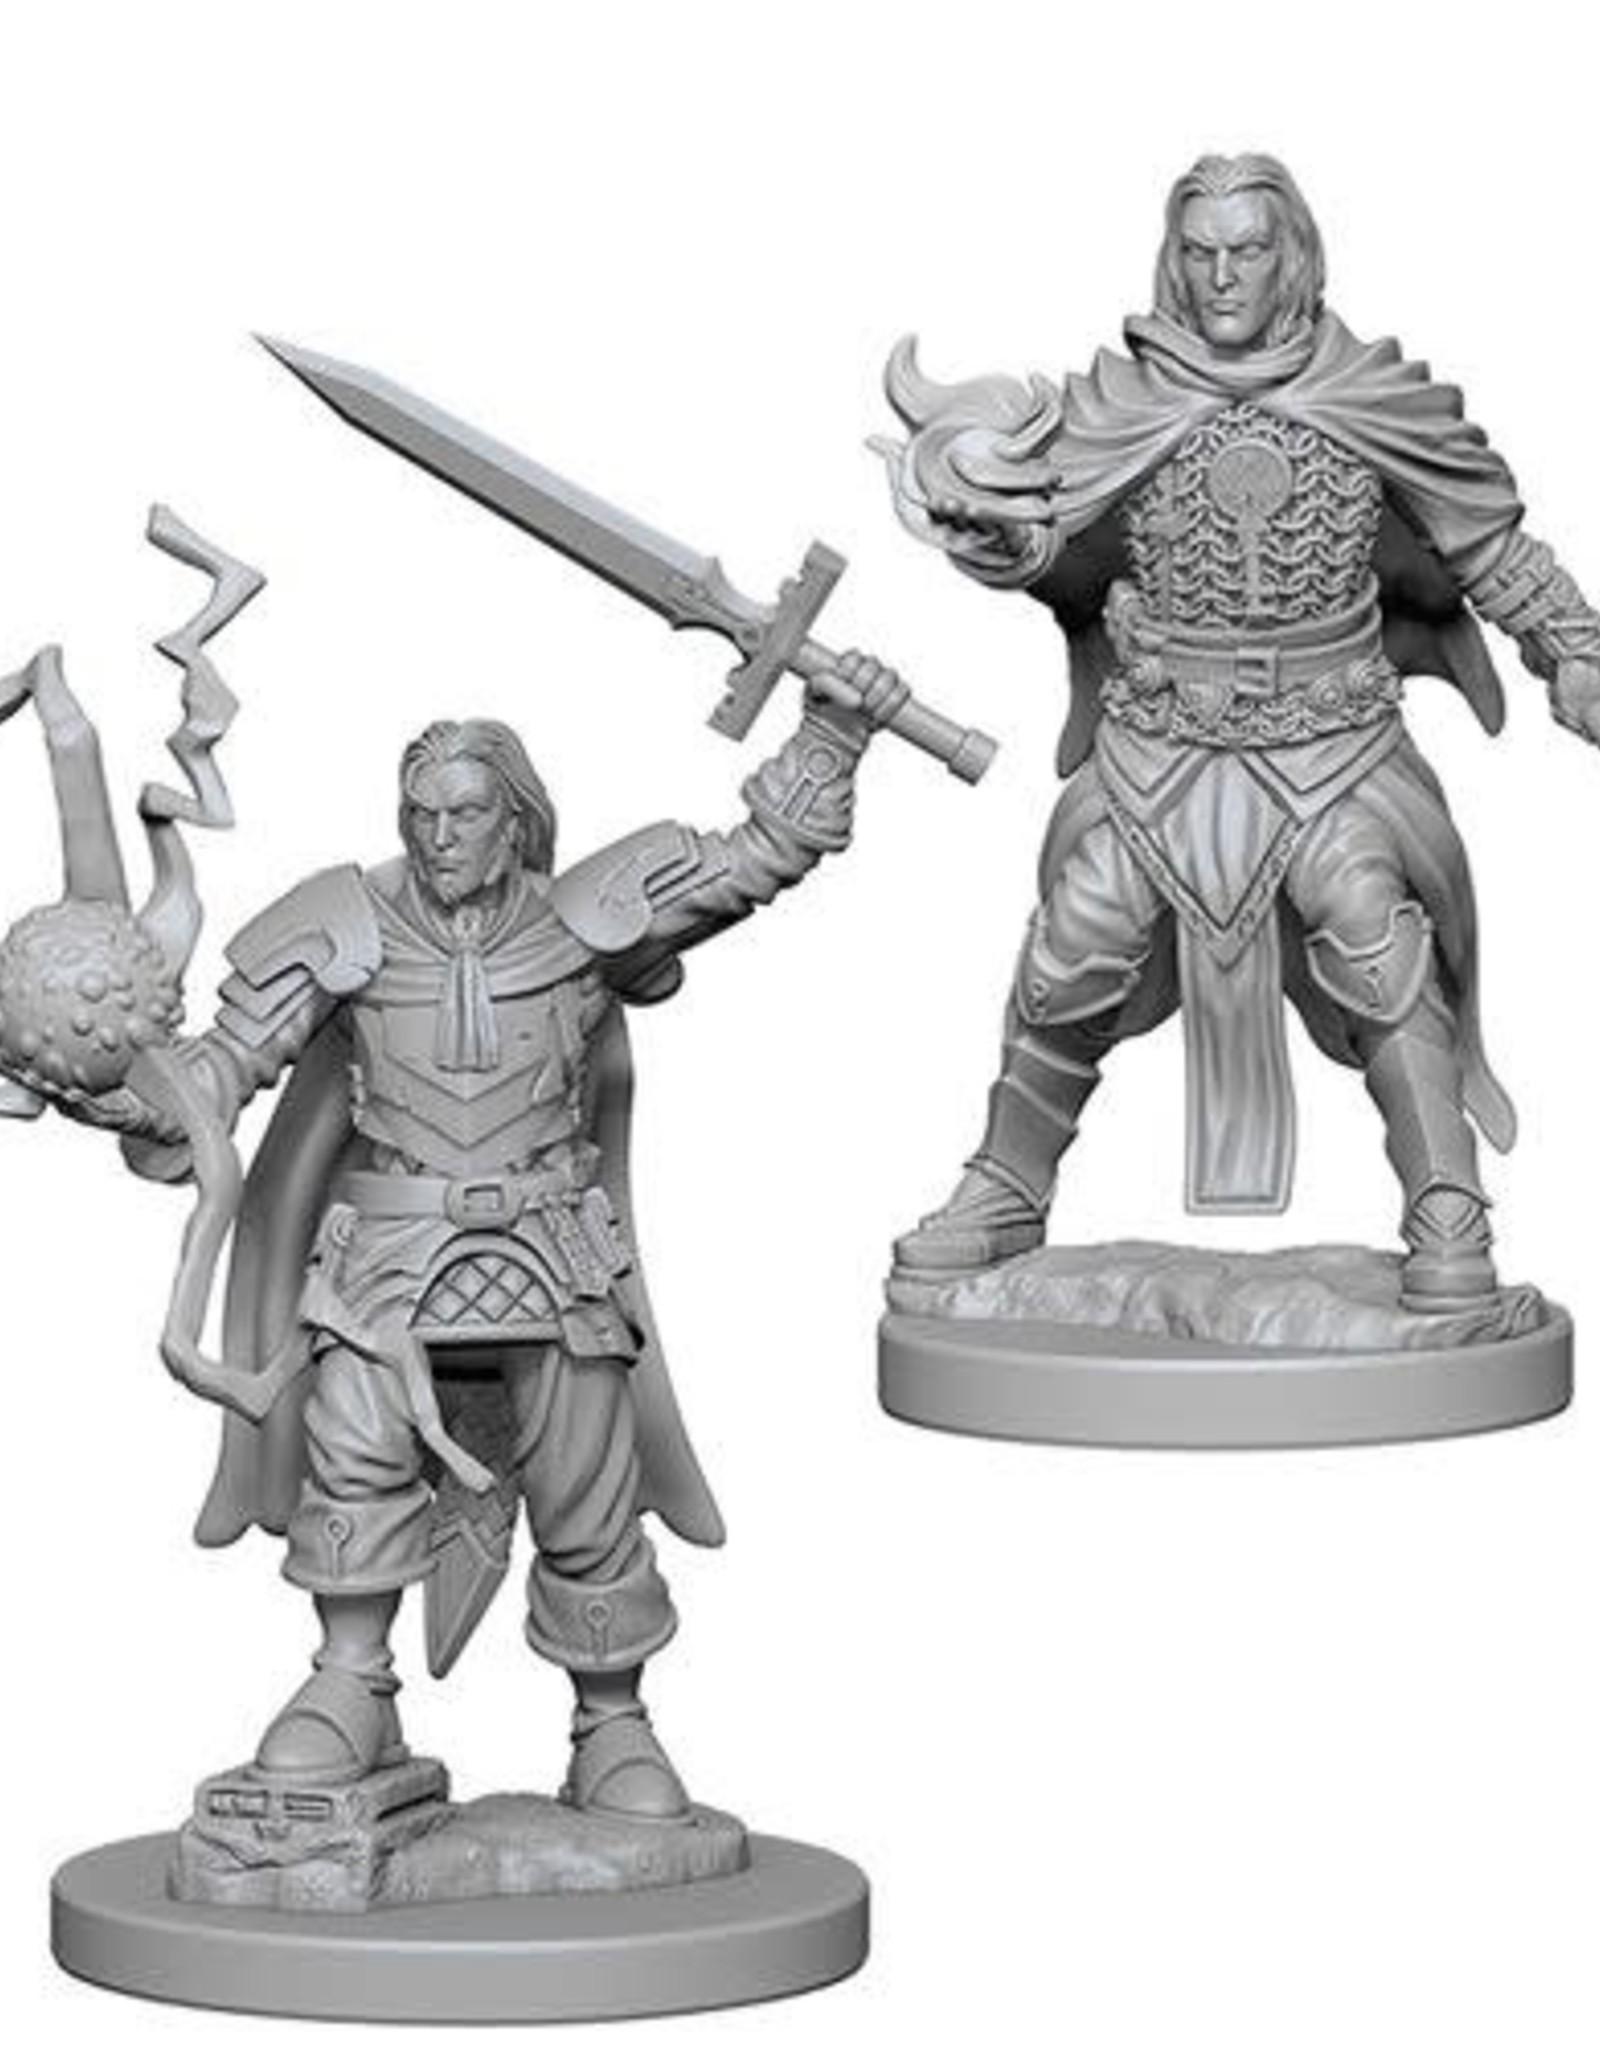 Pathfinder Deep Cuts Unpainted Miniatures: W1 Human Male Cleric